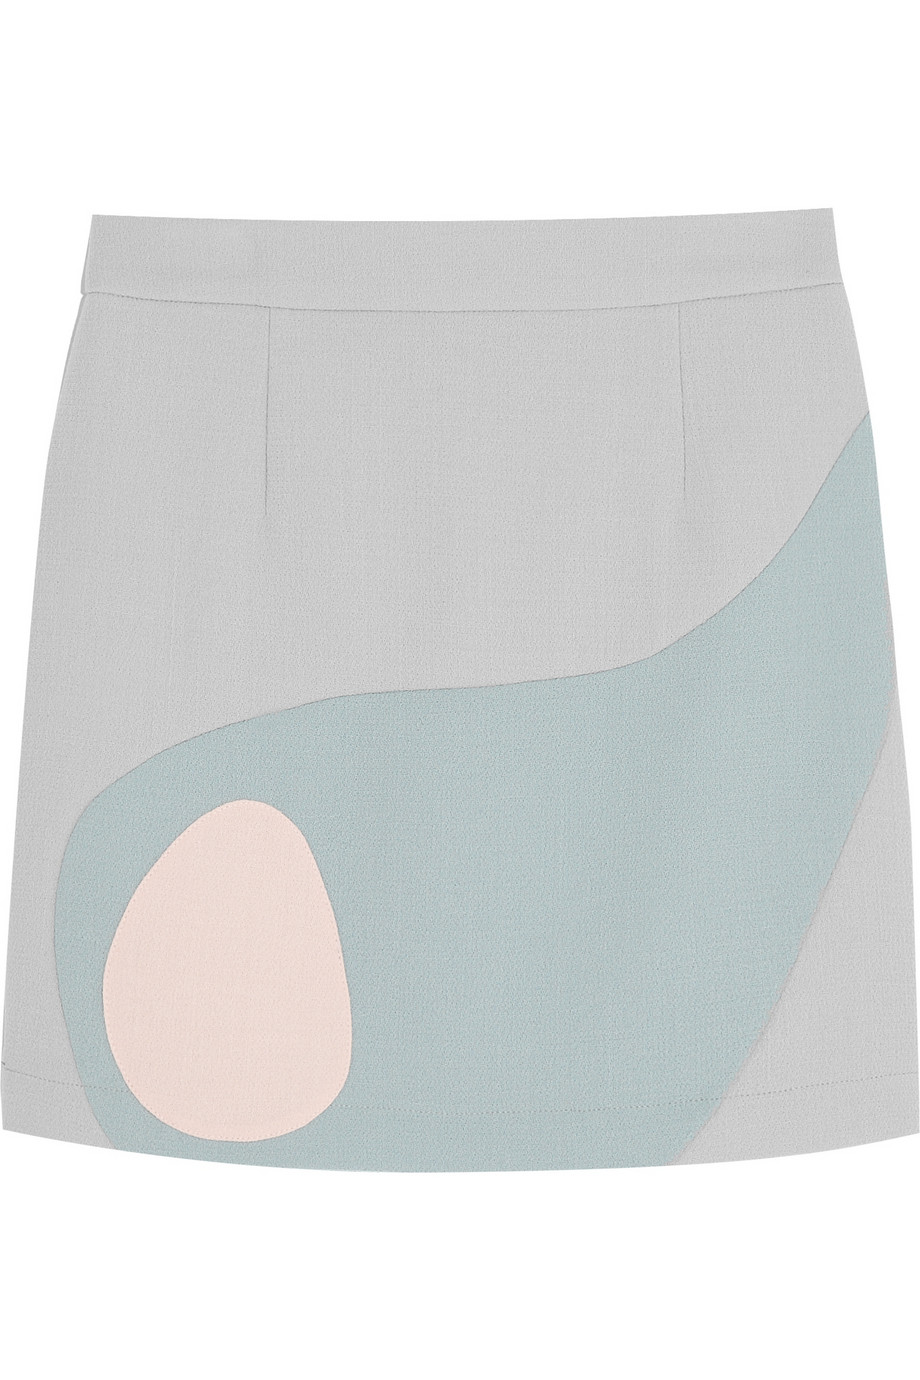 From Resort 15: the Ramona wool-crepe mini skirt,  £425. www.net-a-porter.com